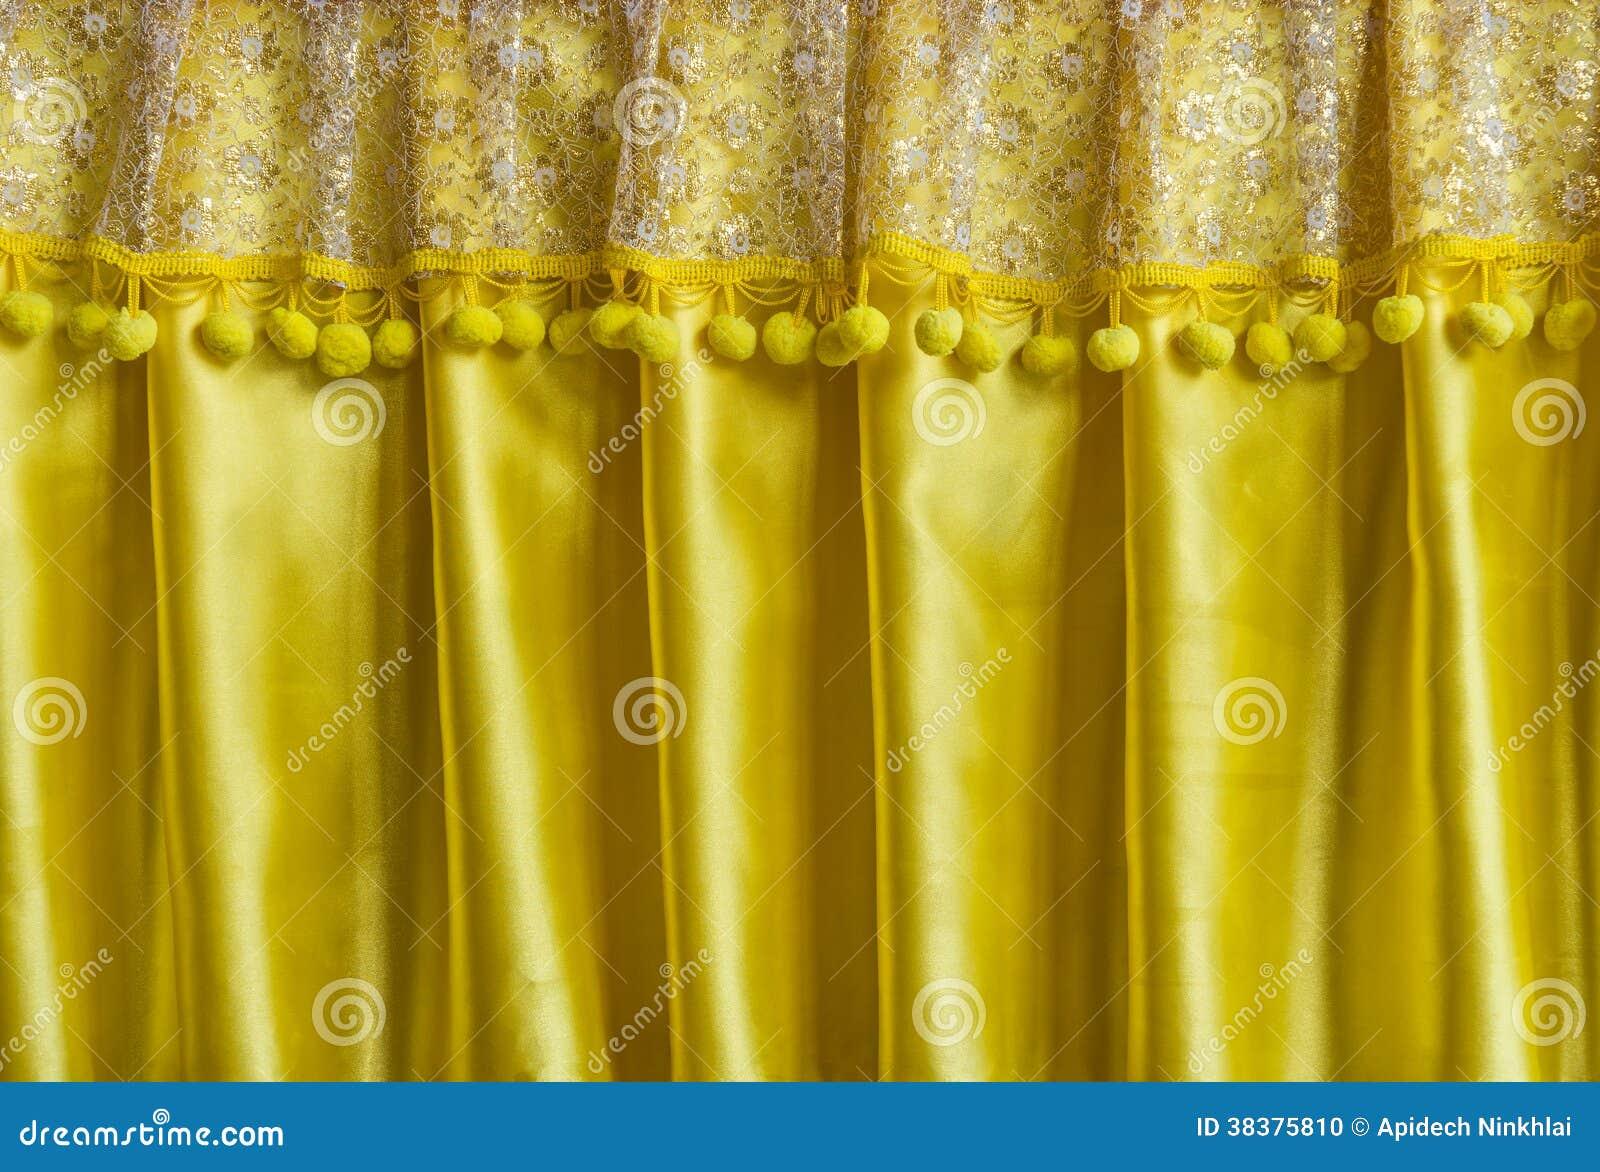 rideau jaune en tissu photo stock image du lumineux 38375810. Black Bedroom Furniture Sets. Home Design Ideas